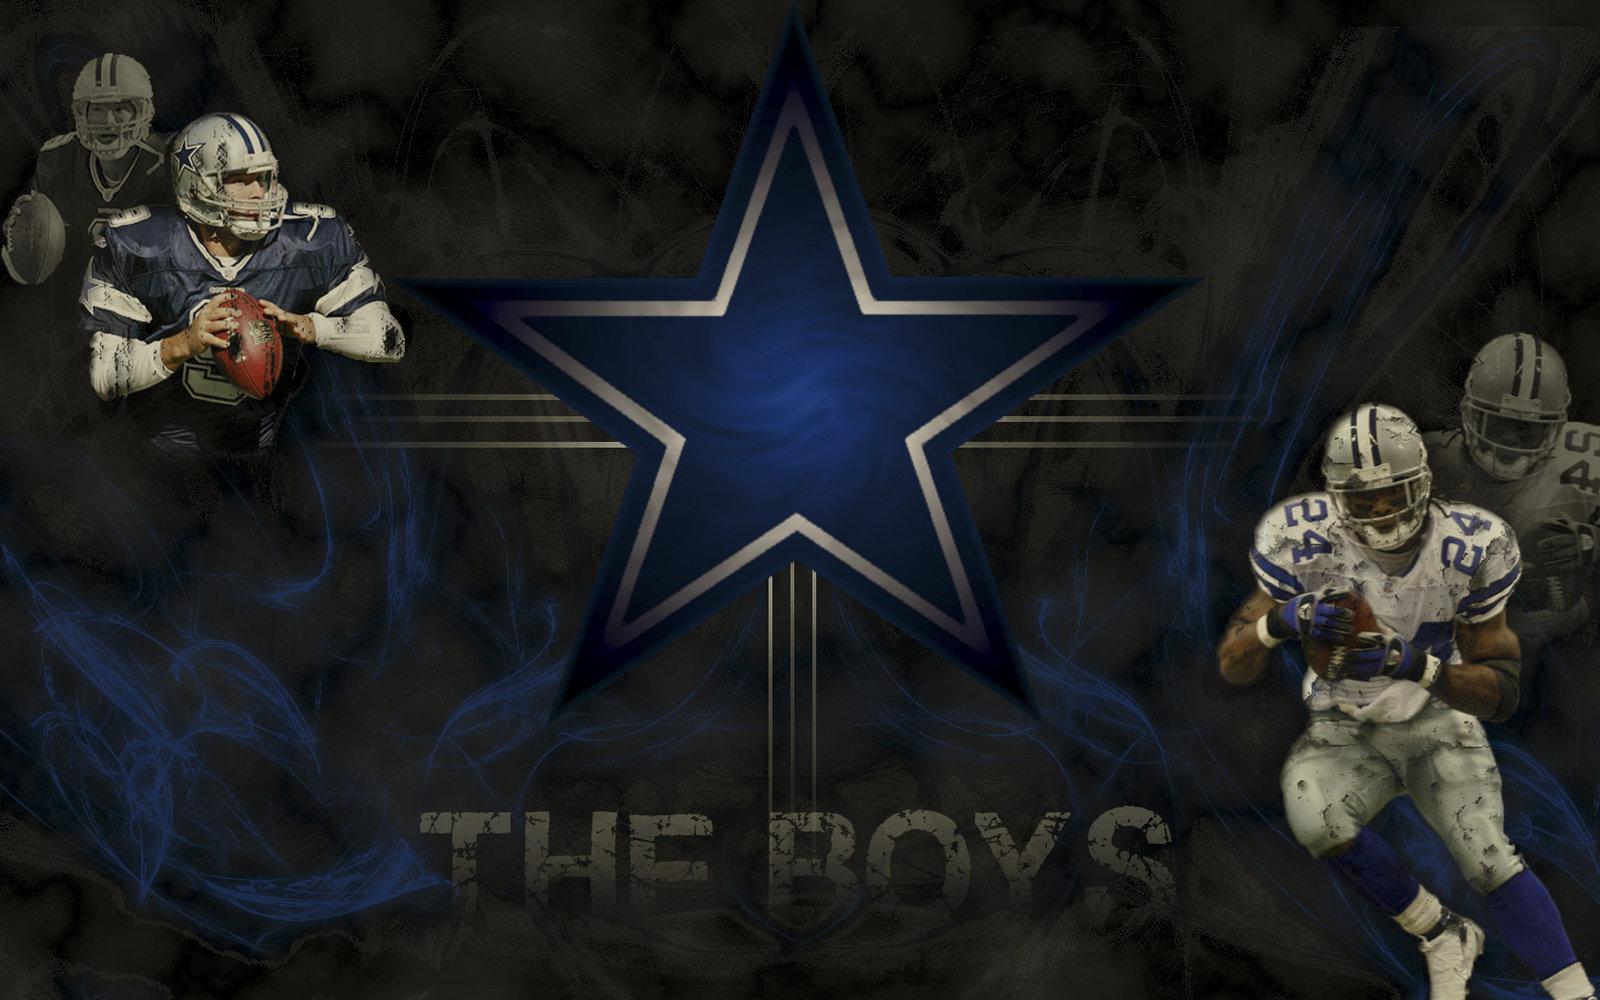 Dallas Cowboys Wallpaper Desktop Wallpaper WallpaperLepi 1600x1000